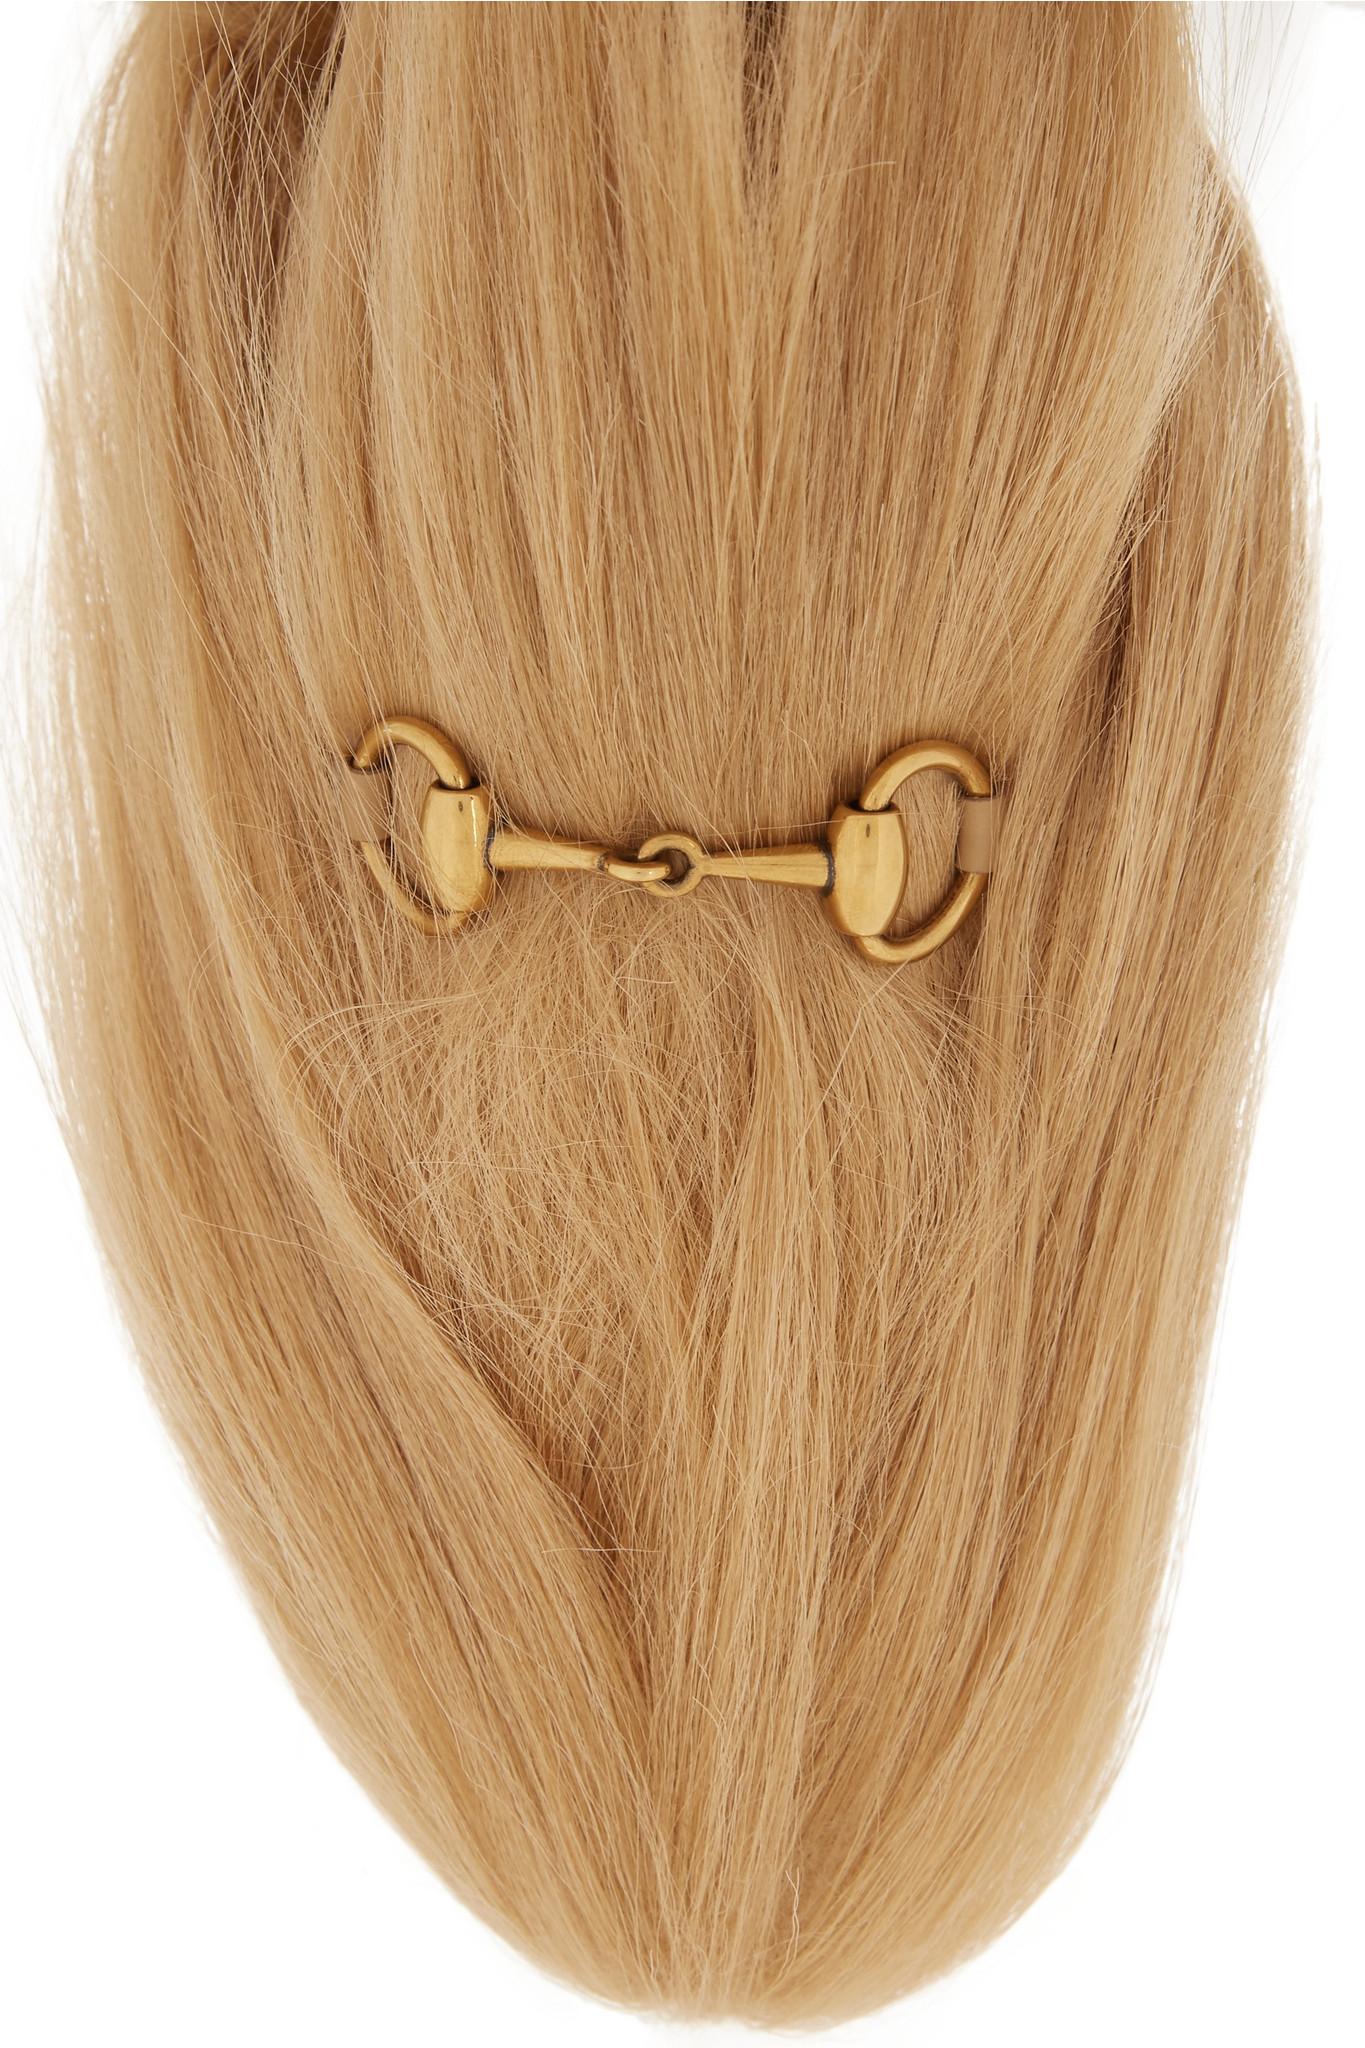 6a2e2e445d08 Lyst - Gucci Horsebit-detailed Goat Hair Slippers in Natural